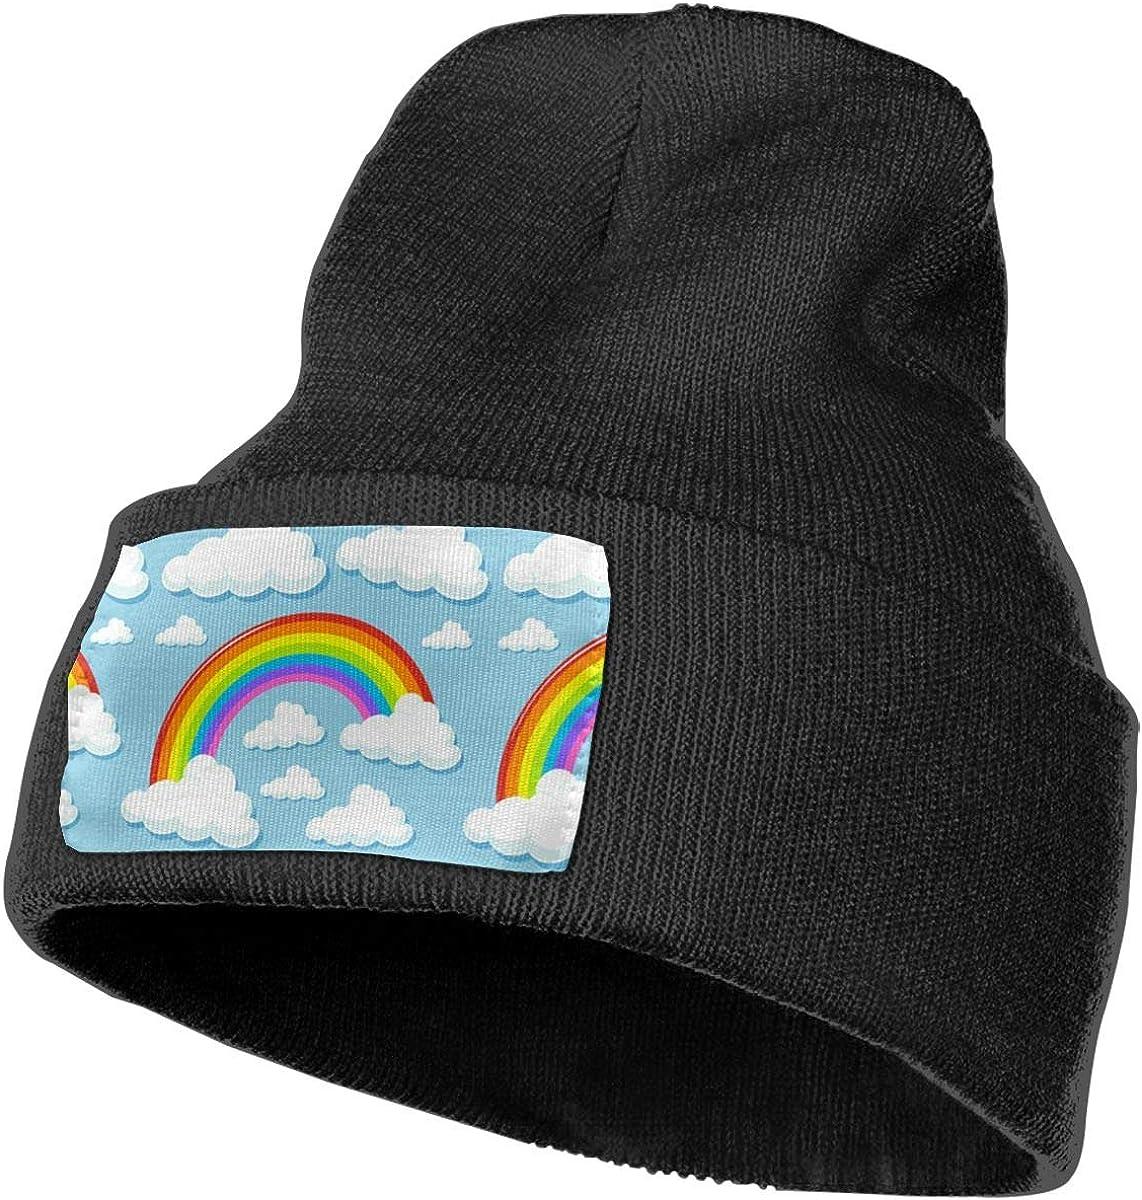 Ruin Rainbow Fashion Knitting Hat for Men Women 100/% Acrylic Acid Mas Beanie Hat